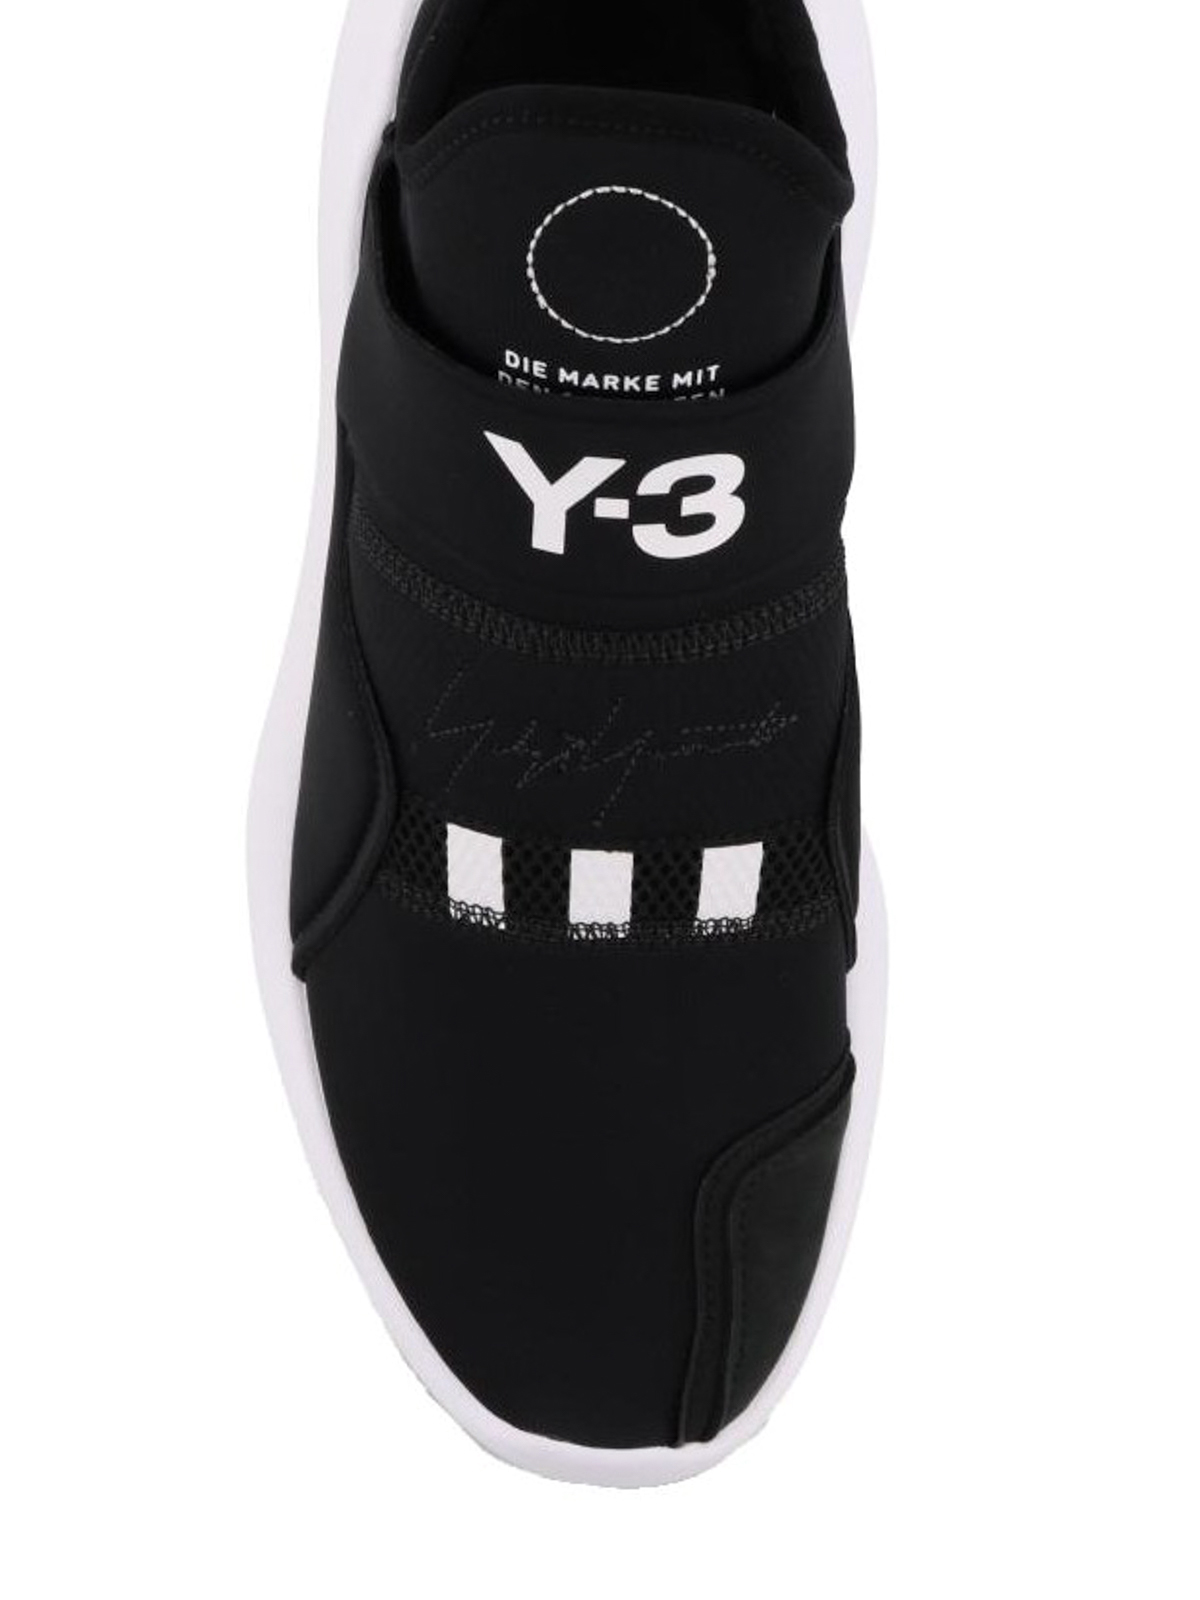 9750c64ab09b Adidas Y-3 - Suberou neoprene slip-on sneakers - trainers - BC0899